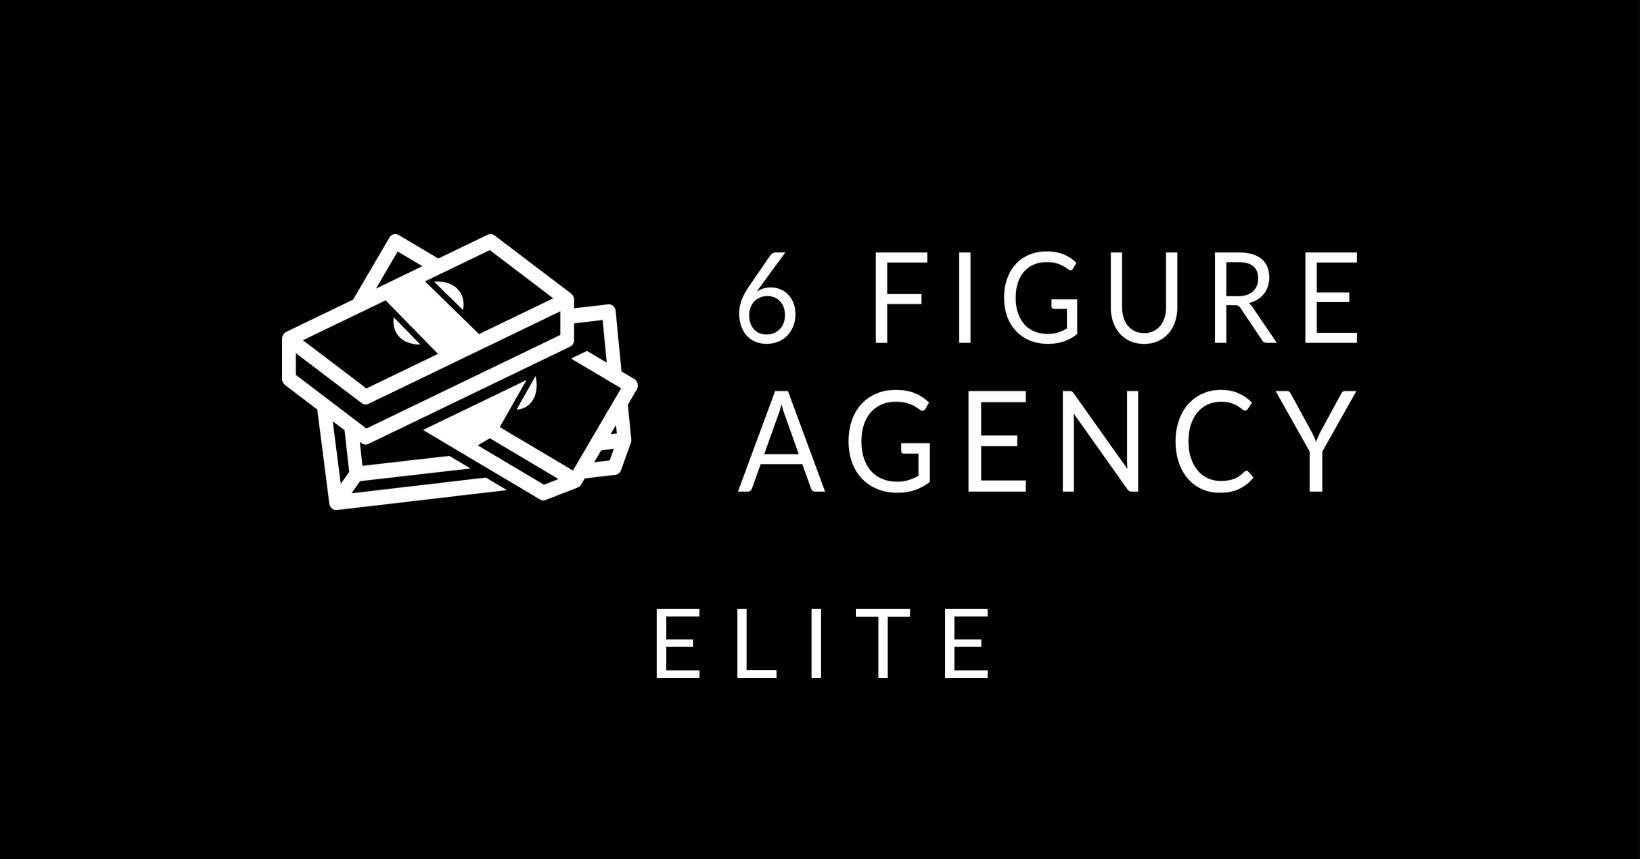 6 Figure Agency Elite